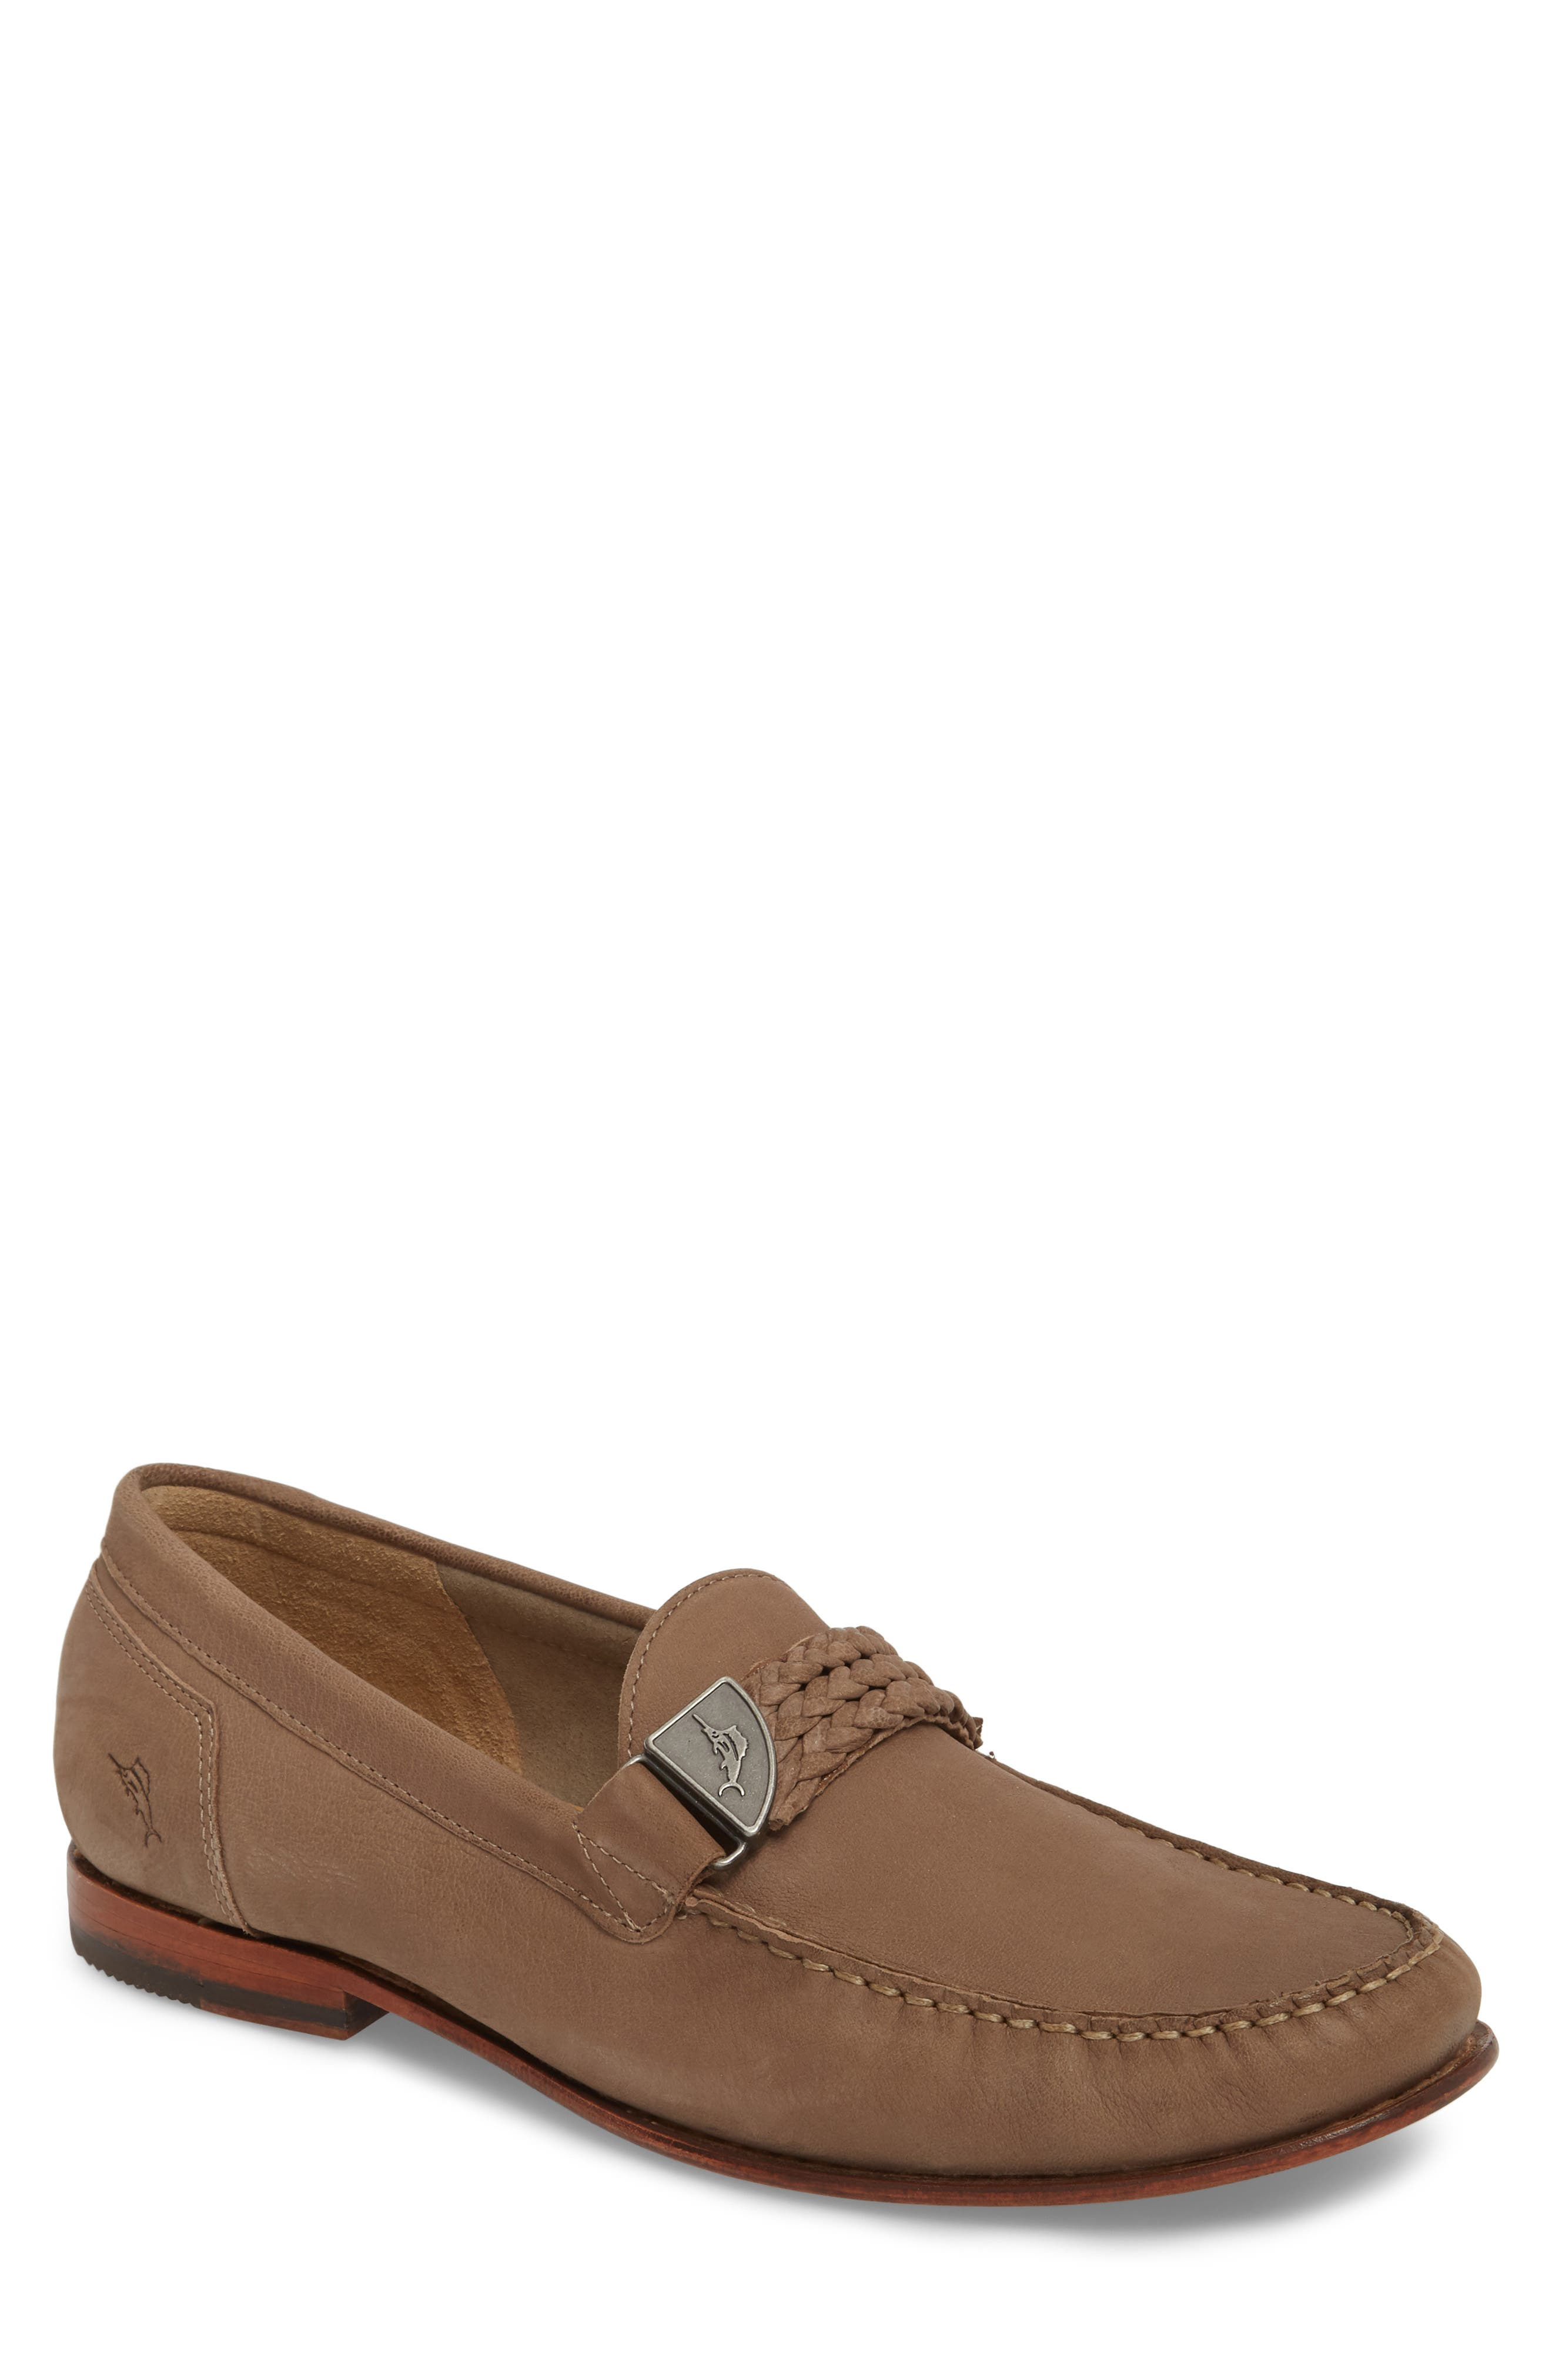 Castington Loafer,                         Main,                         color, TAUPE NUBUCK